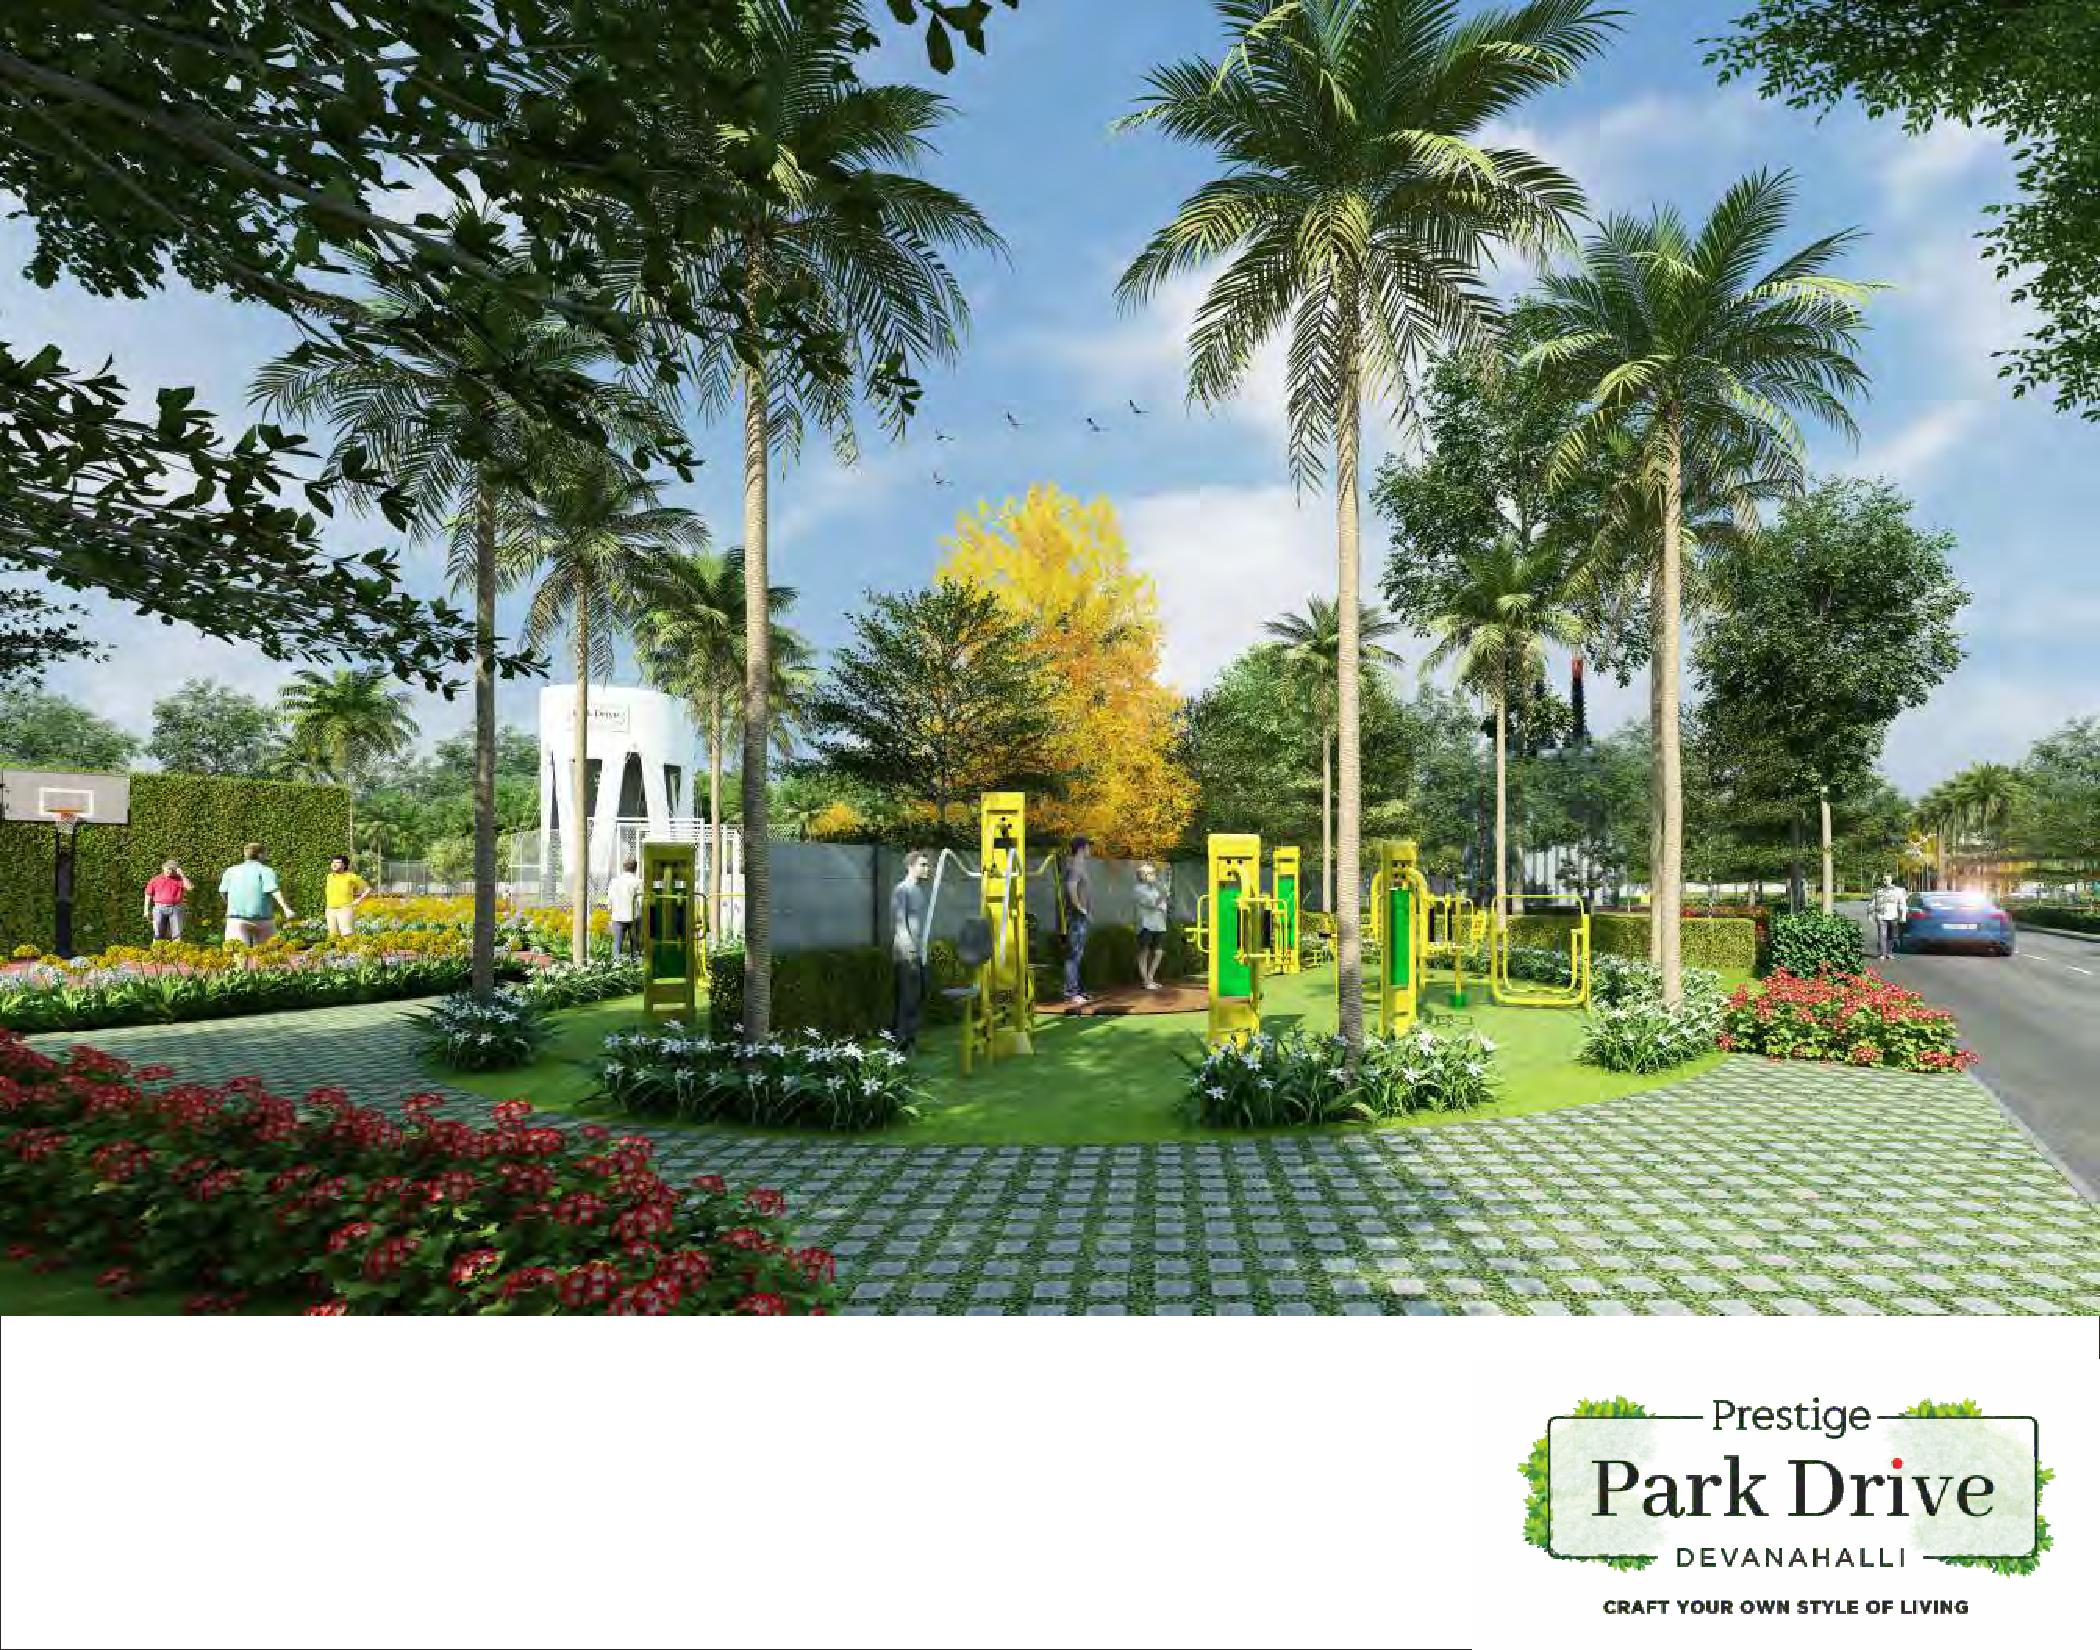 Prestige-Park-Drive-Plot-in-Devanahalli-Bangalore-Image-09